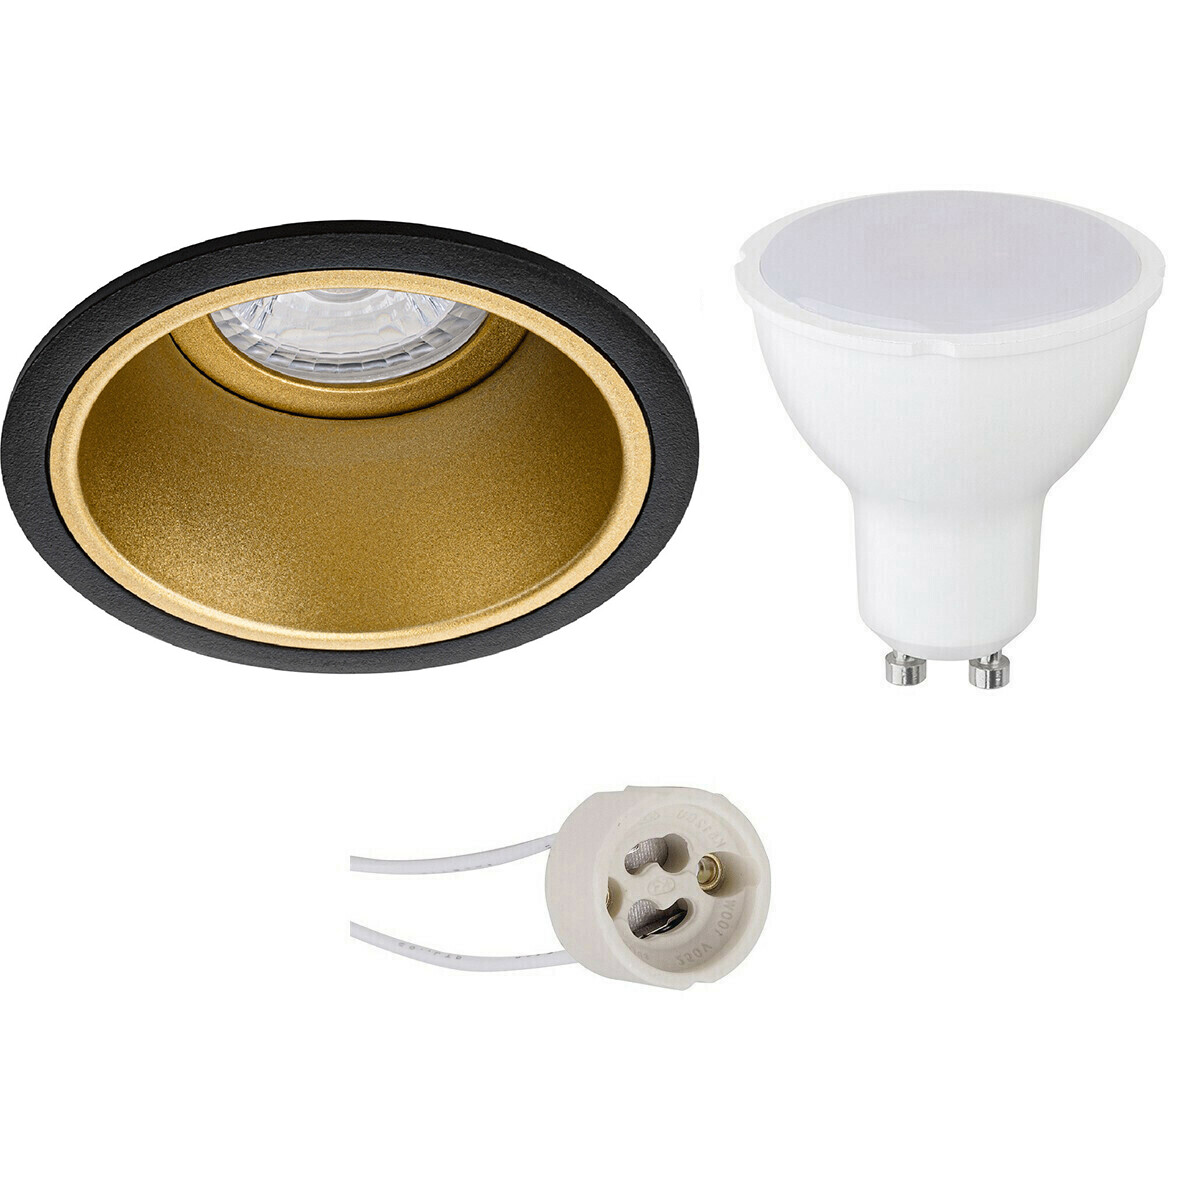 LED Spot Set - Pragmi Minko Pro - GU10 Fitting - Inbouw Rond - Mat Zwart/Goud - 6W - Natuurlijk Wit